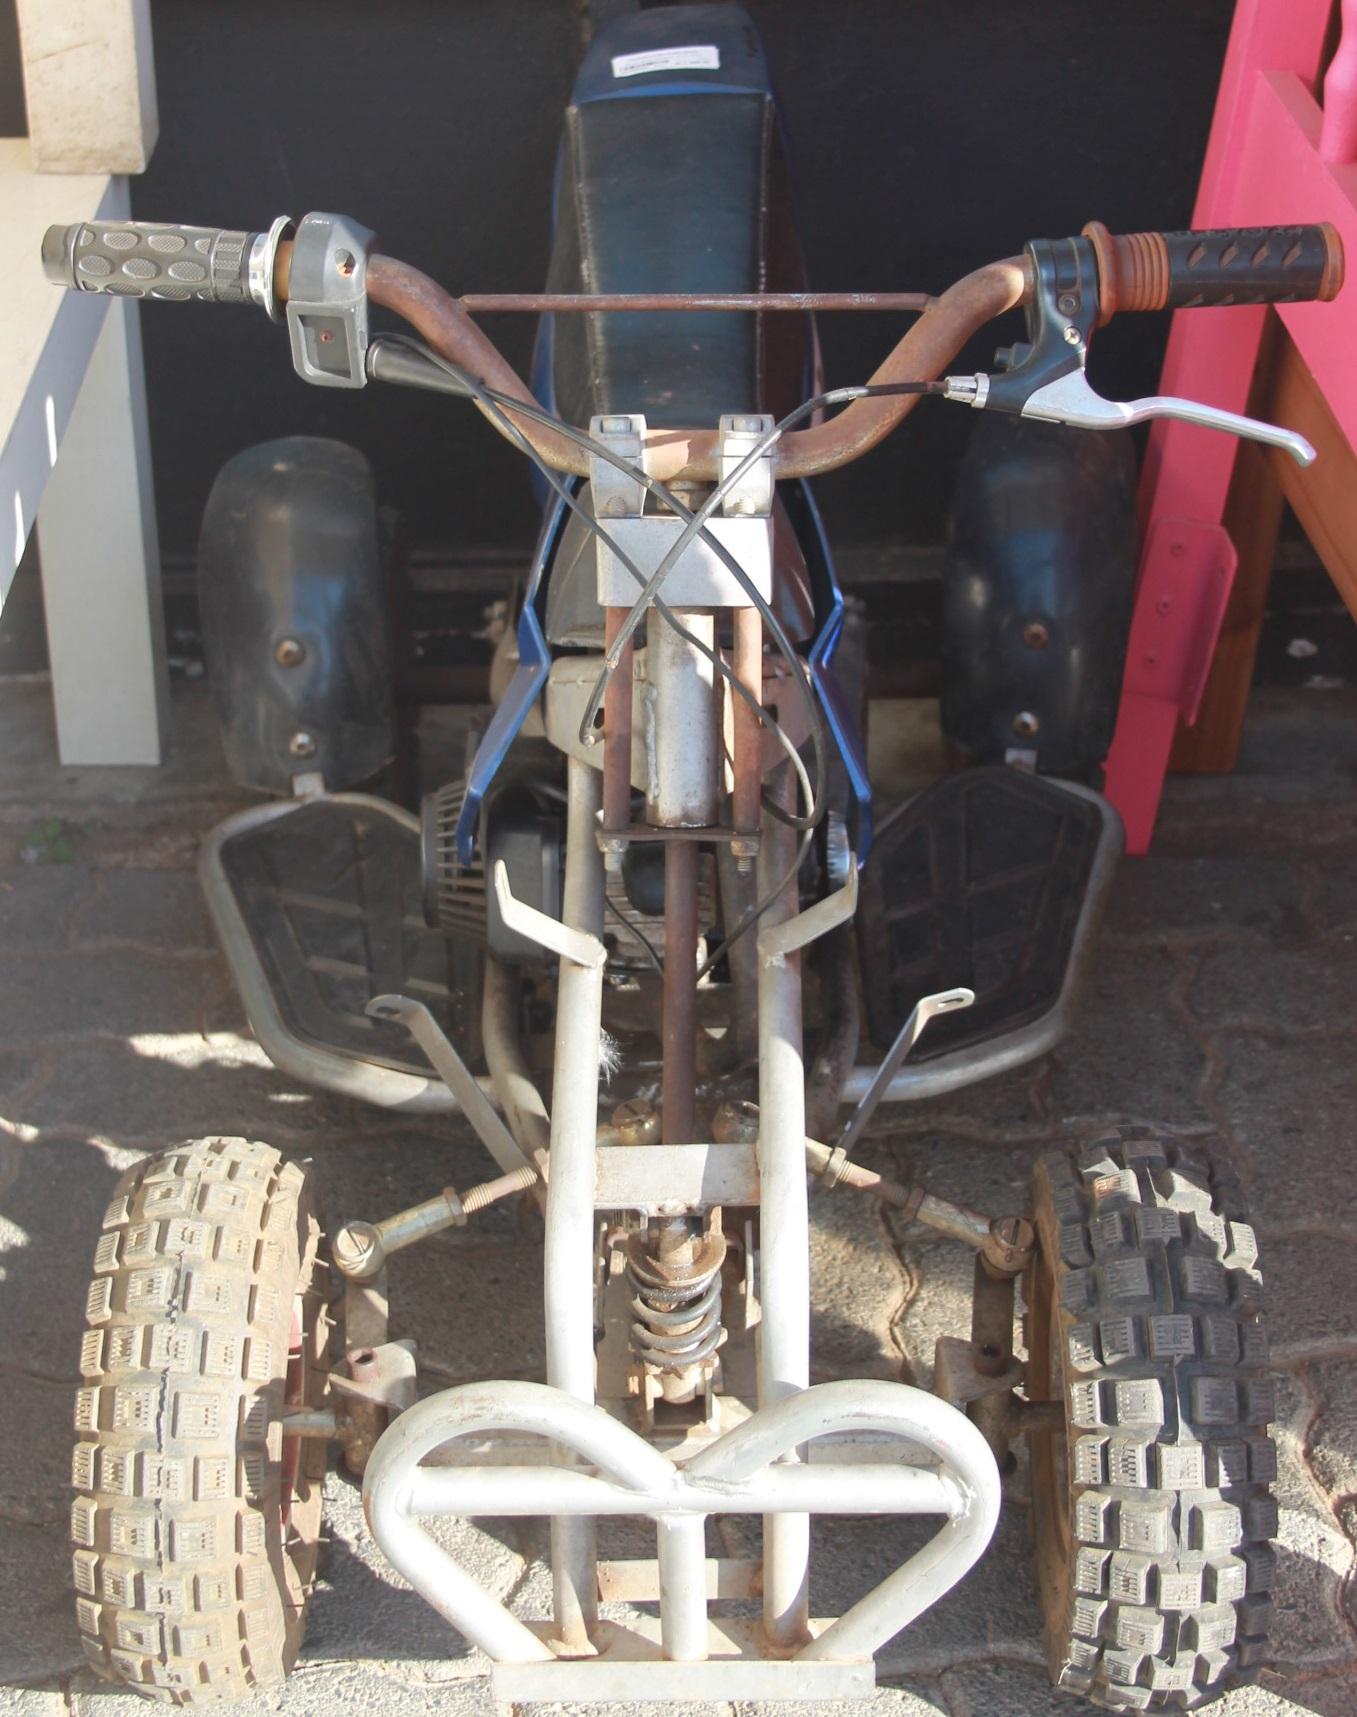 S035549A Blue 49cc petrol quad bike #Rosettenvillepawnshop